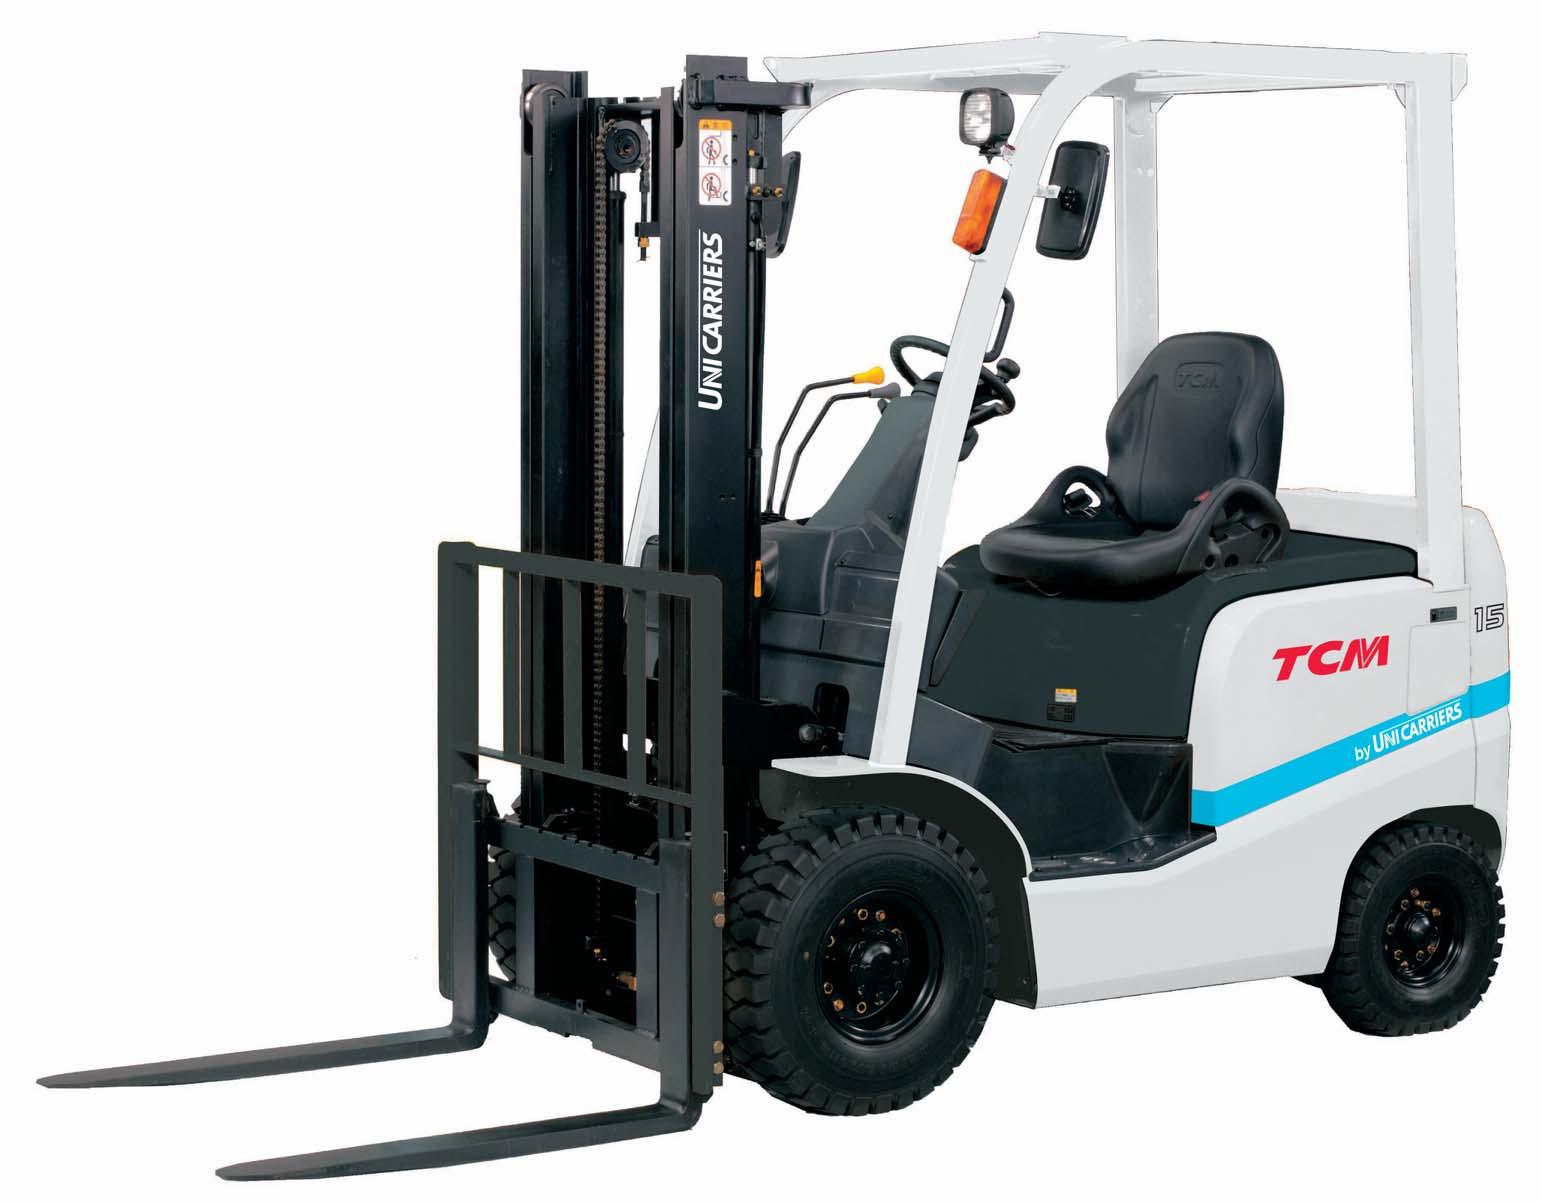 TCM FG25C3